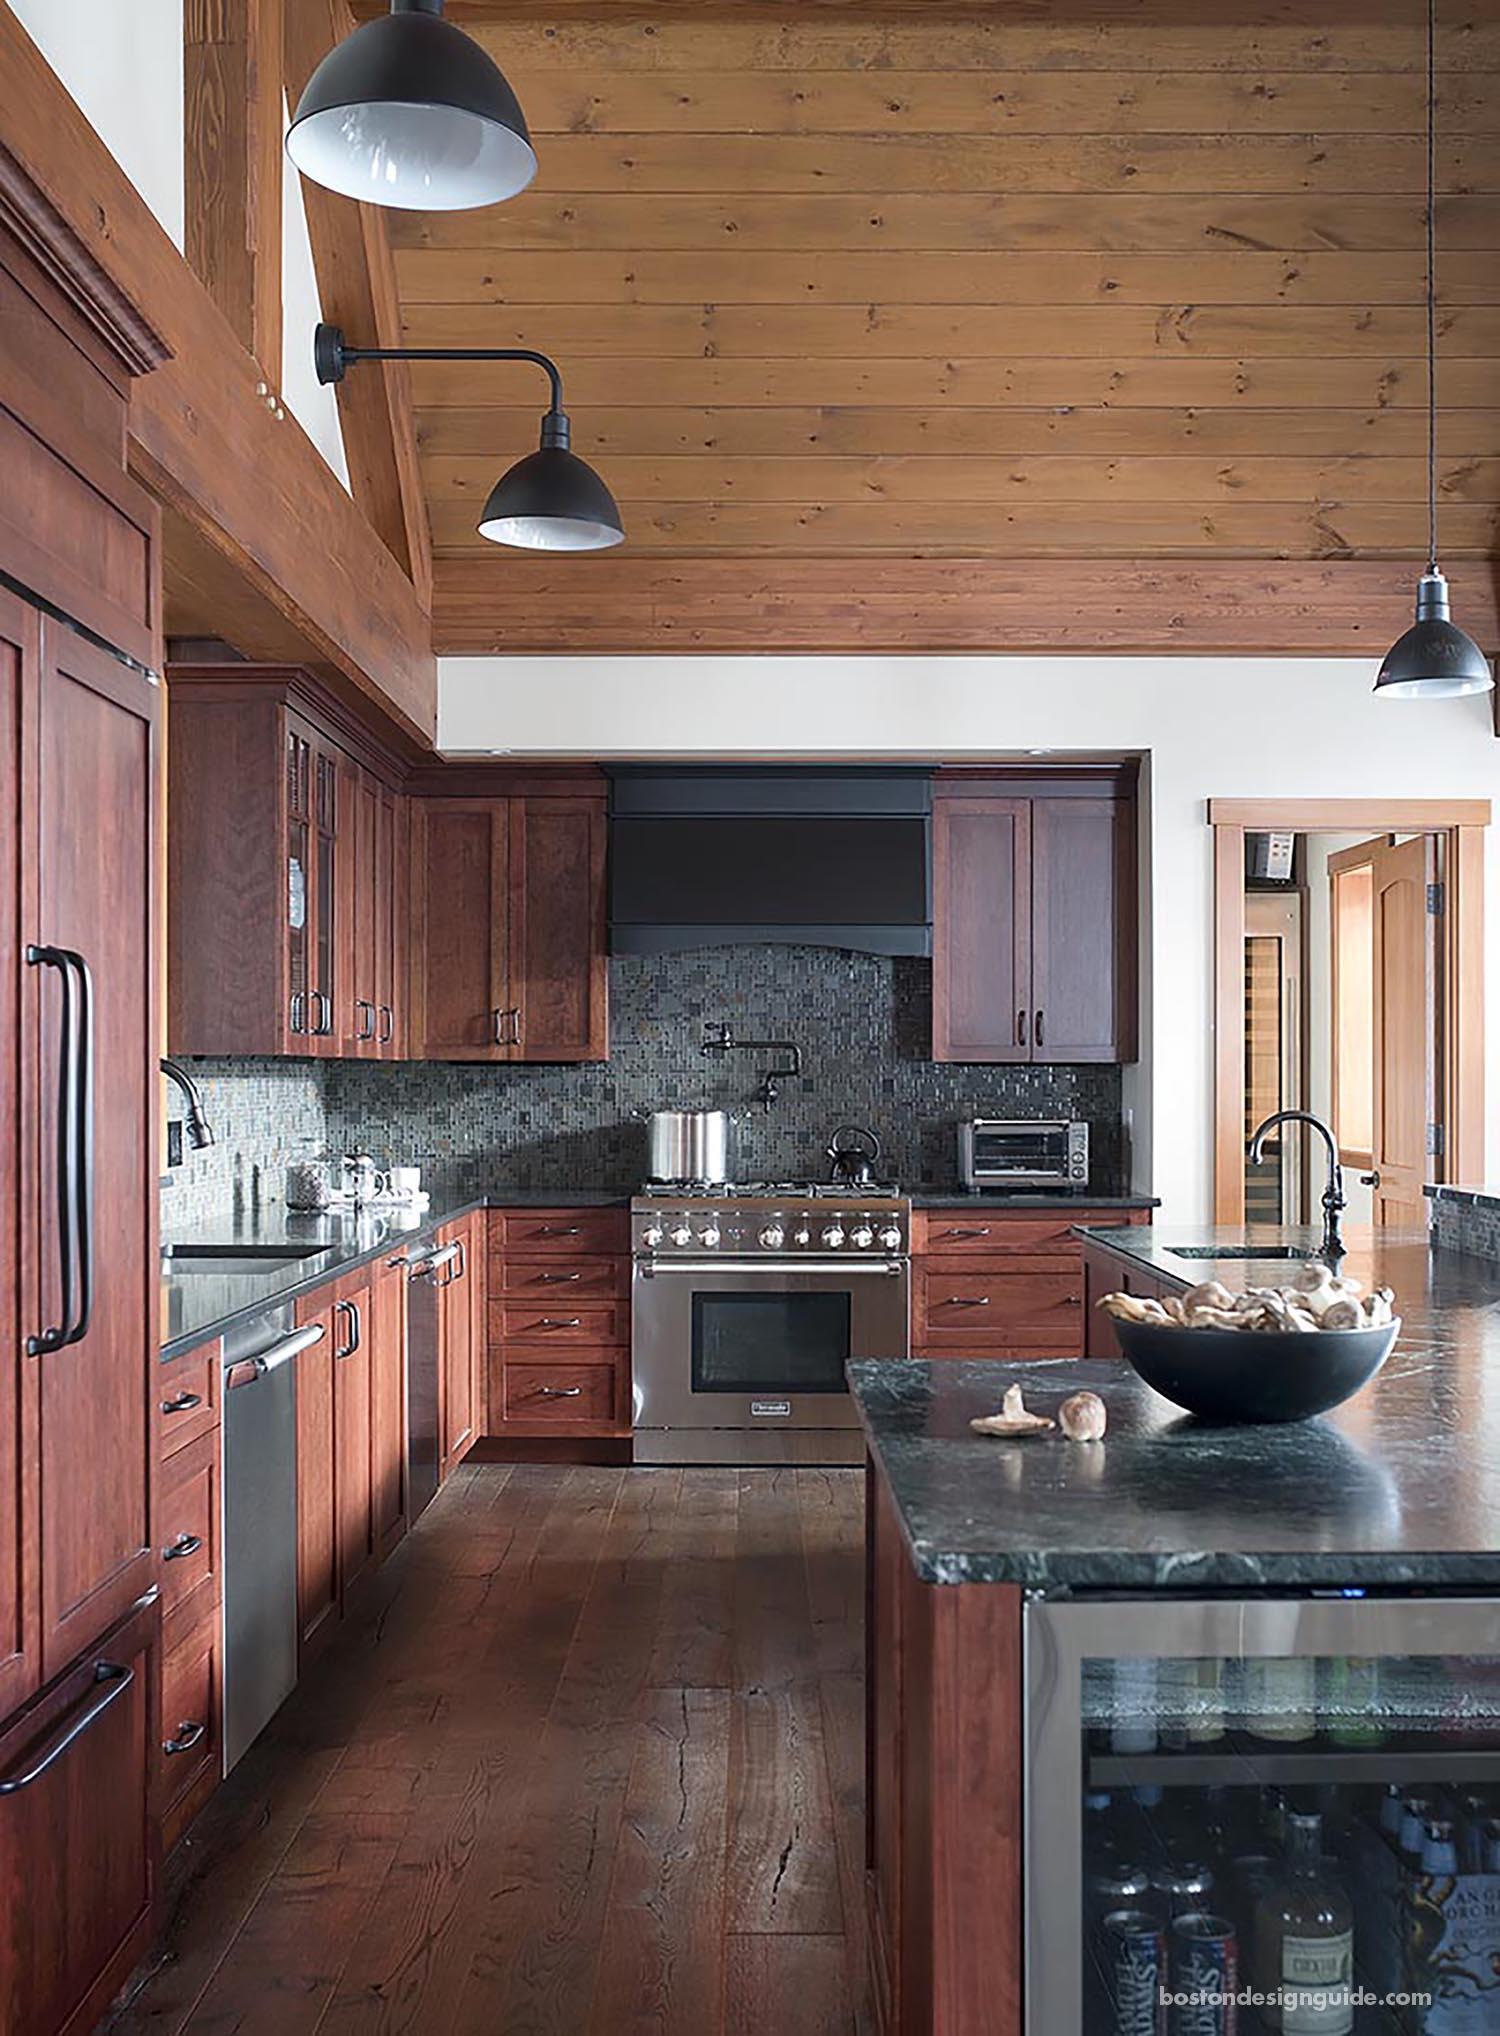 Bensonwood | Boston Design Guide